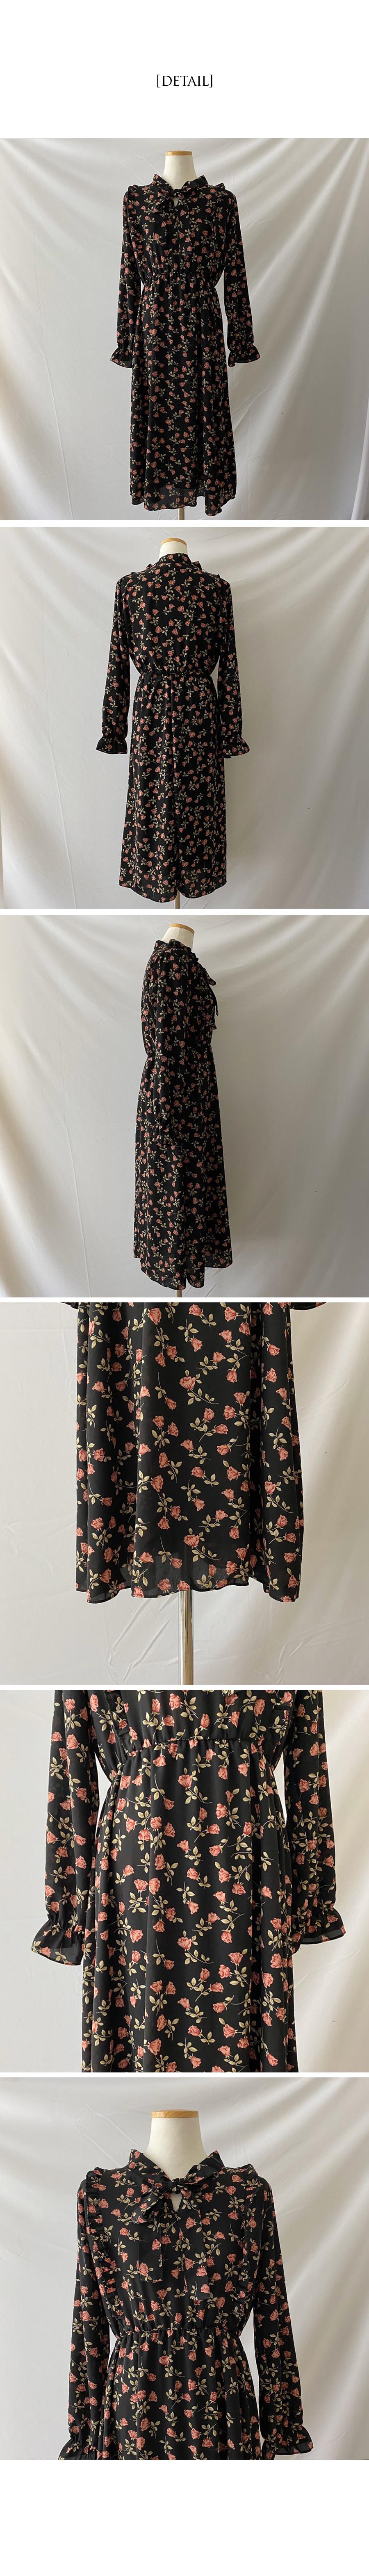 Potpourri Flower Ruffled Chiffon Long Dress